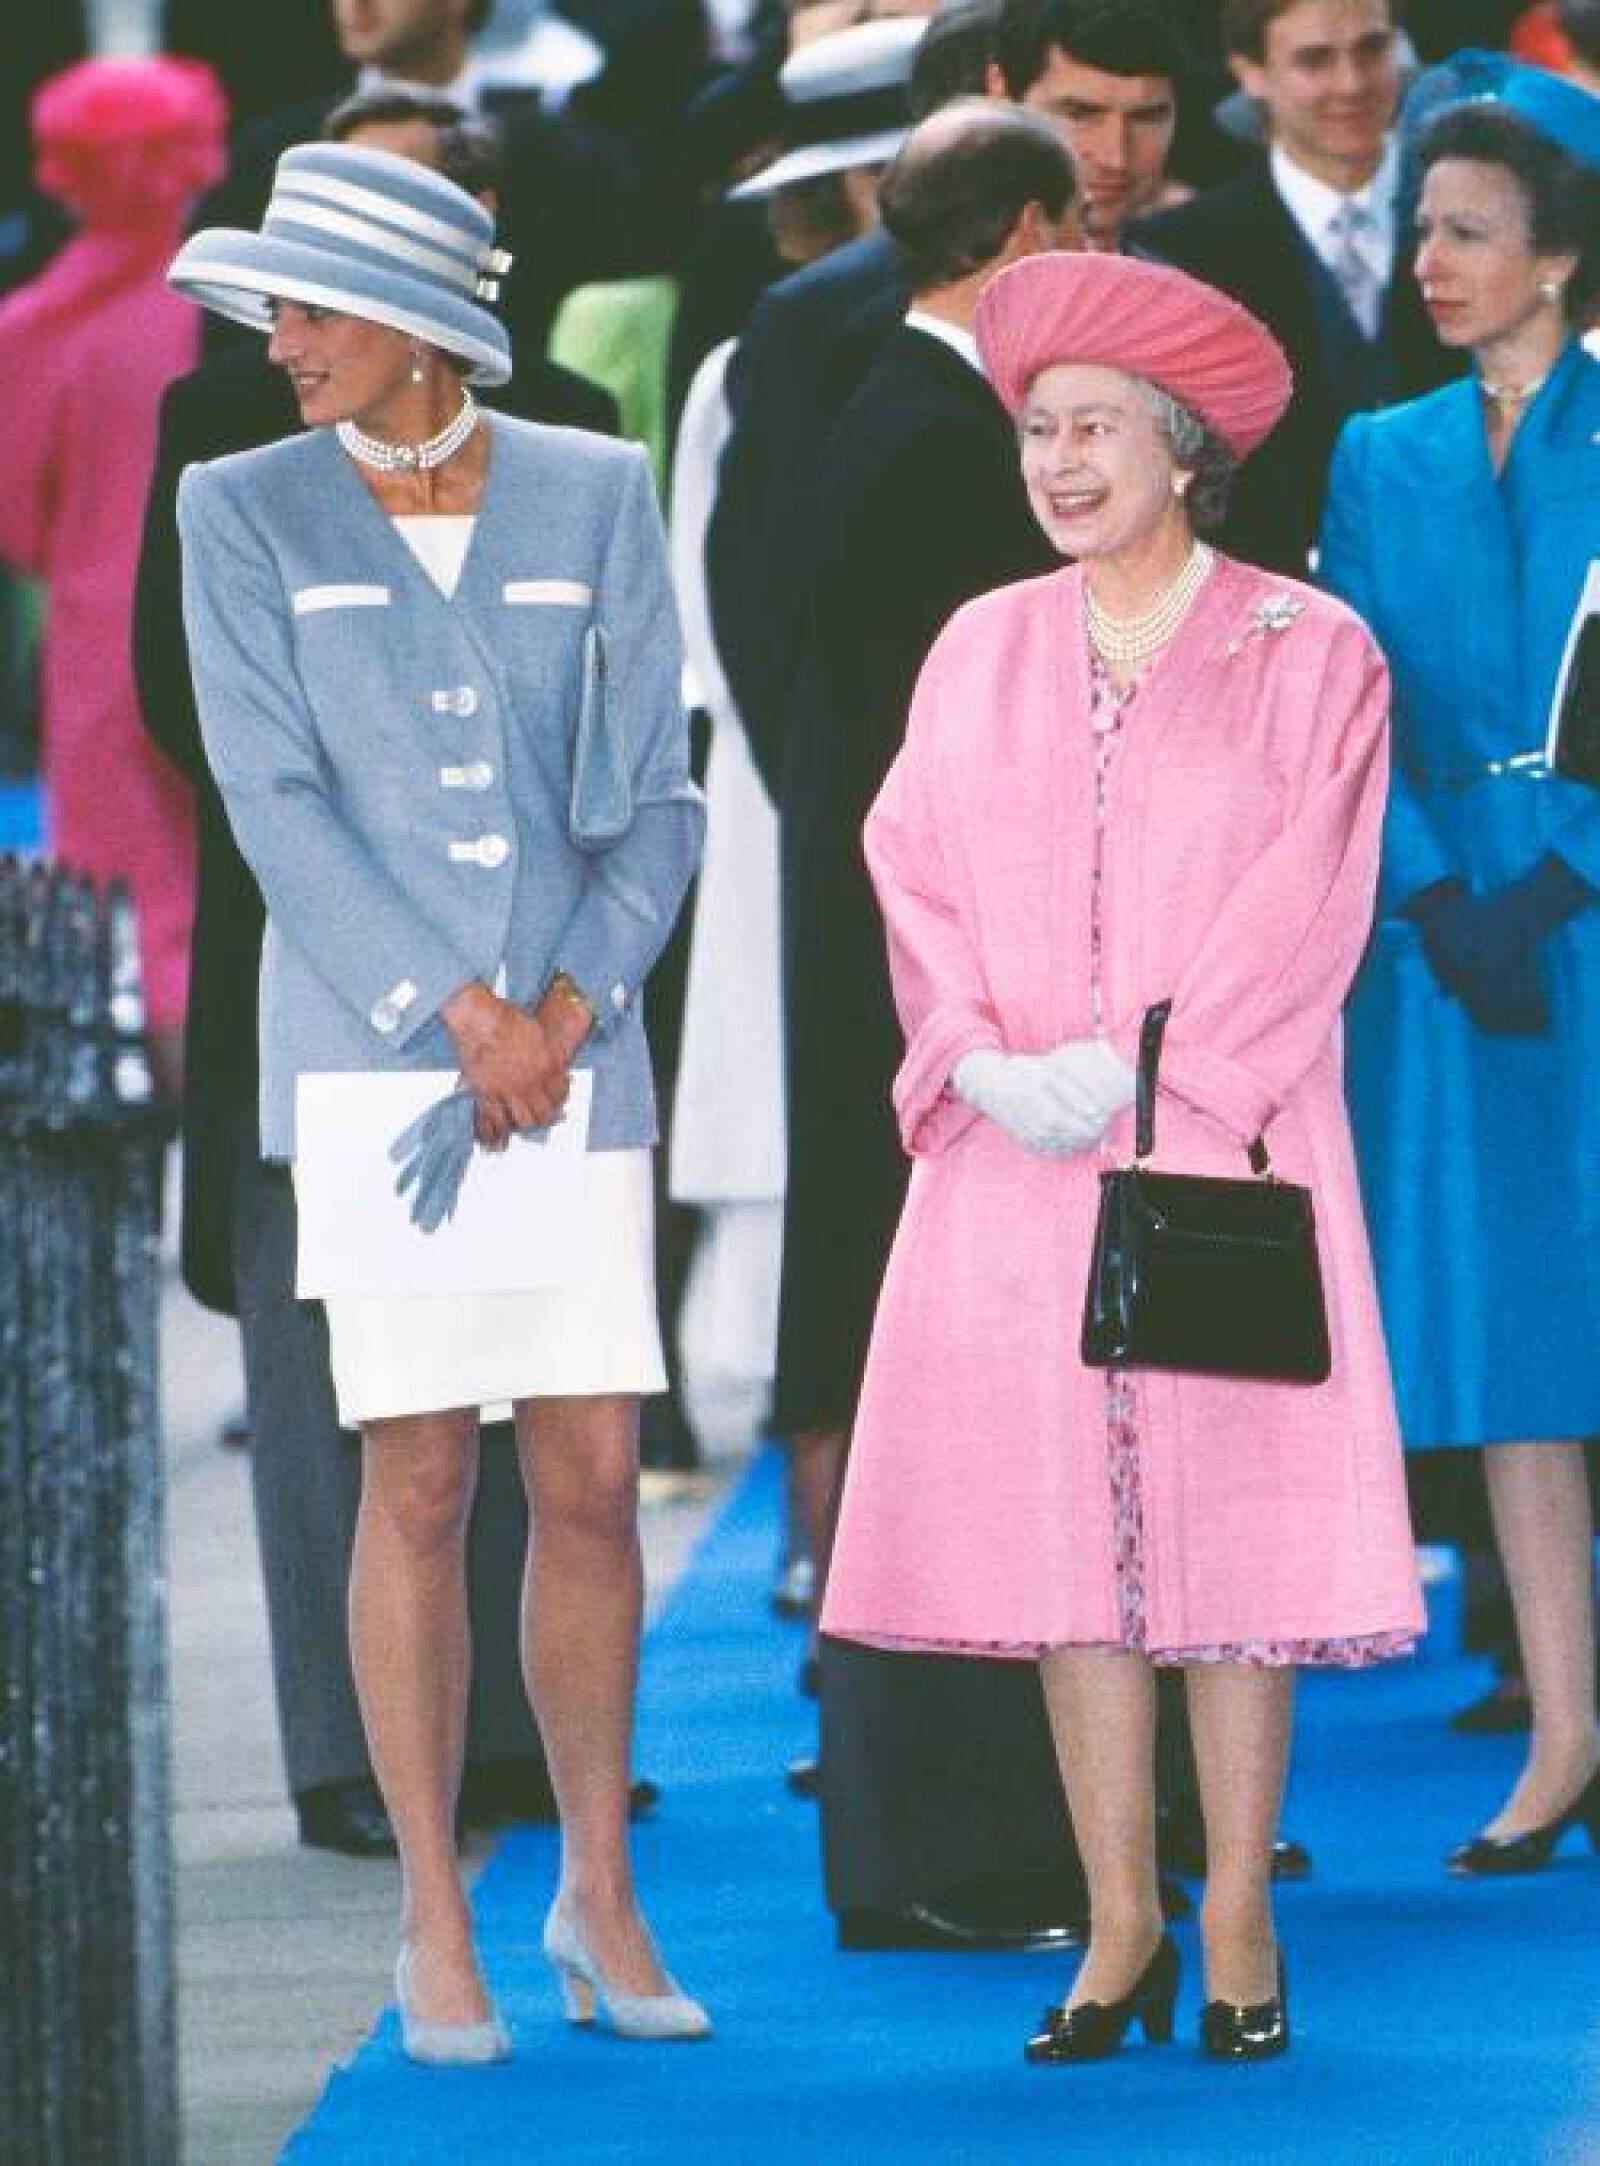 princess-diana-wedding-guest-outfits-255818-1524689588103-image.500x0c